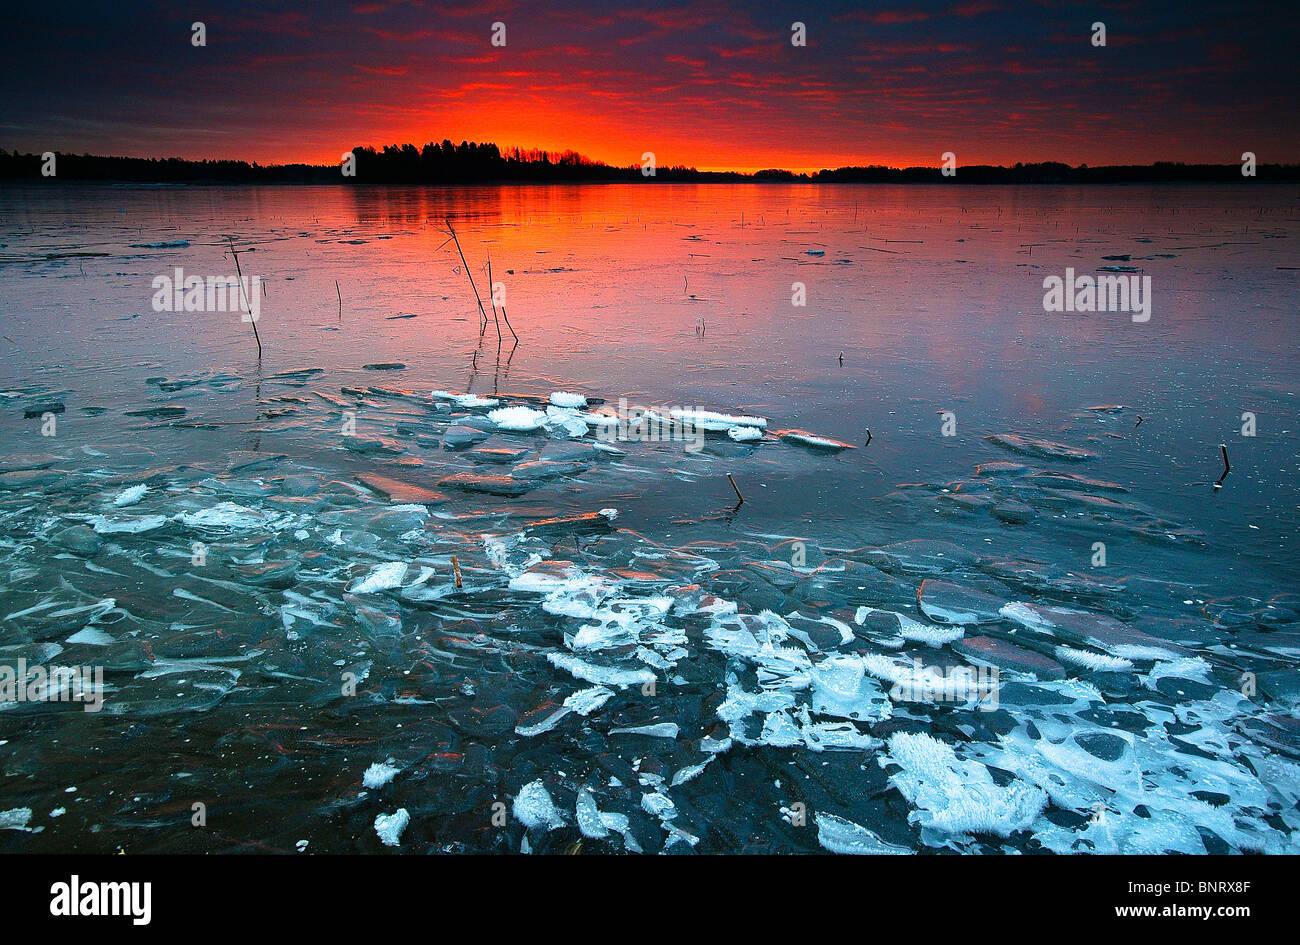 Incredibile inverno sunrise nel lago Vansjø a Årvold, Rygge kommune, Østfold fylke, Norvegia. Immagini Stock